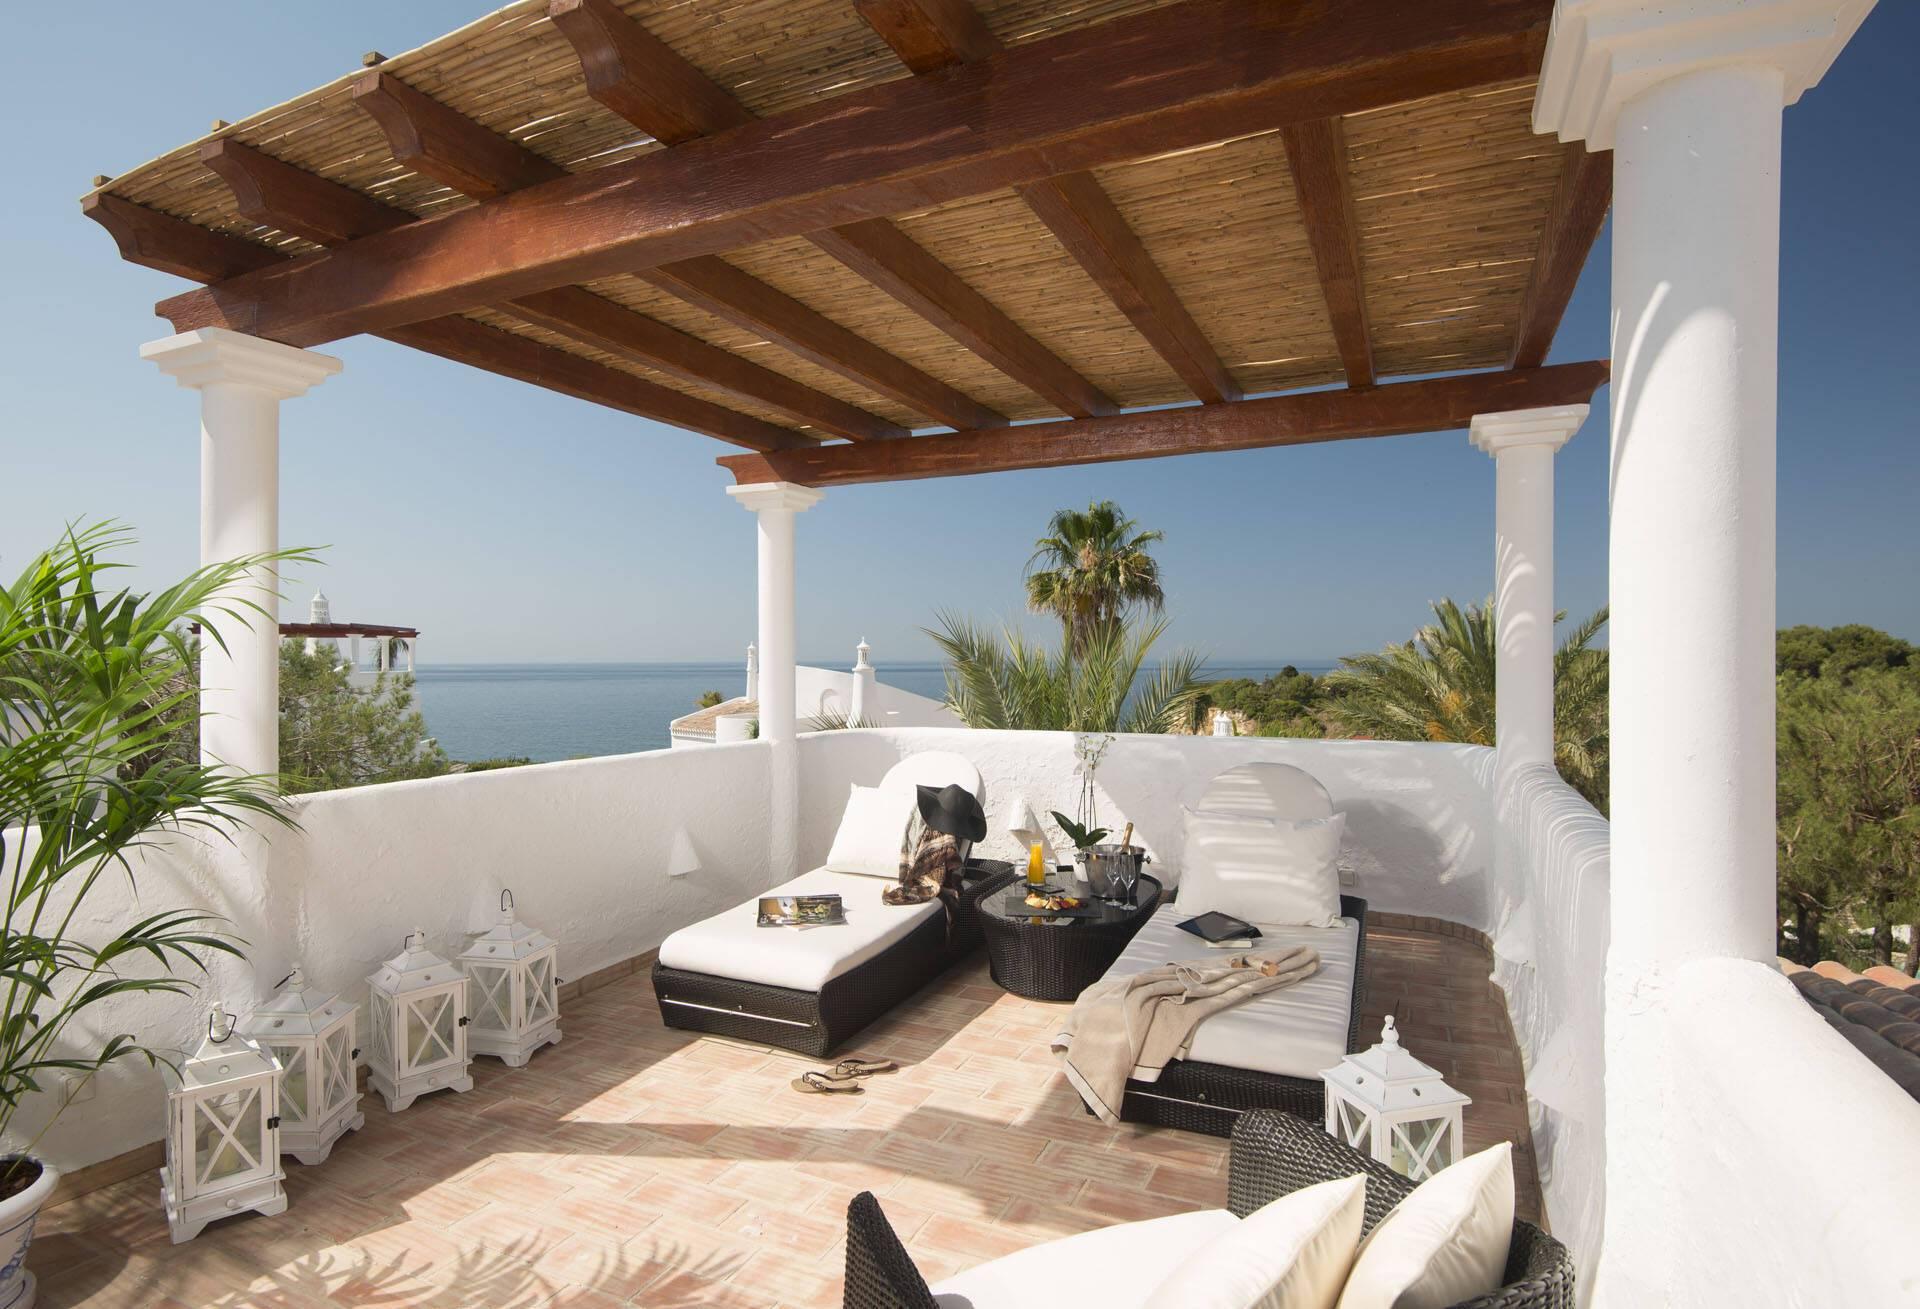 Vila Vita Parc Algarve Portugal Oasis suite premium Rooftop